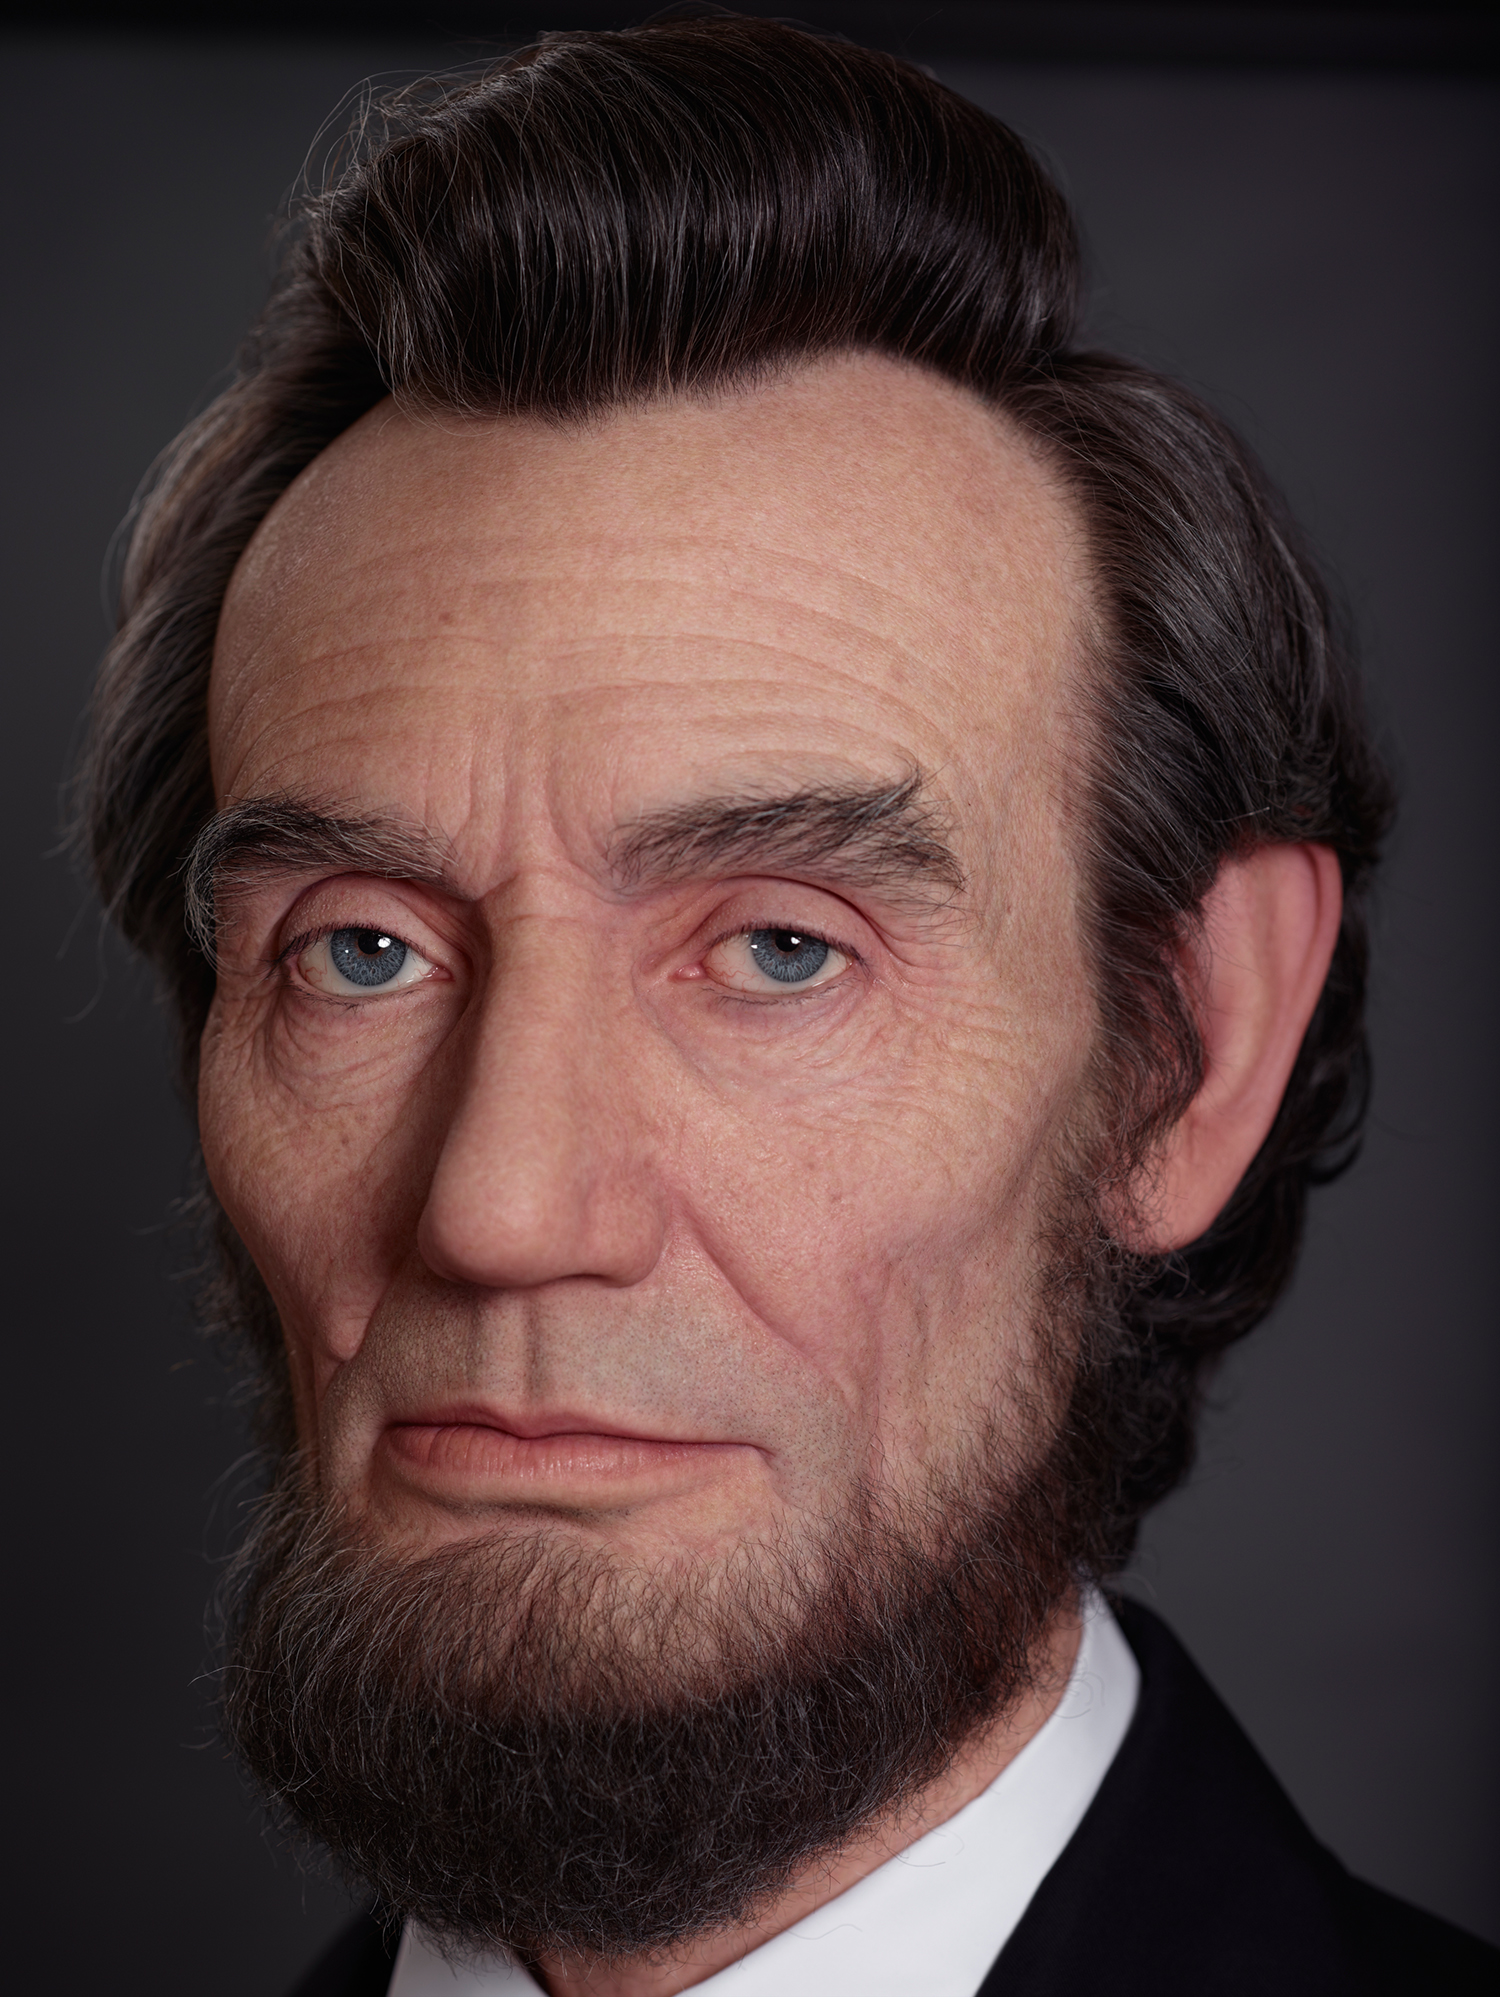 Lincoln042.jpg